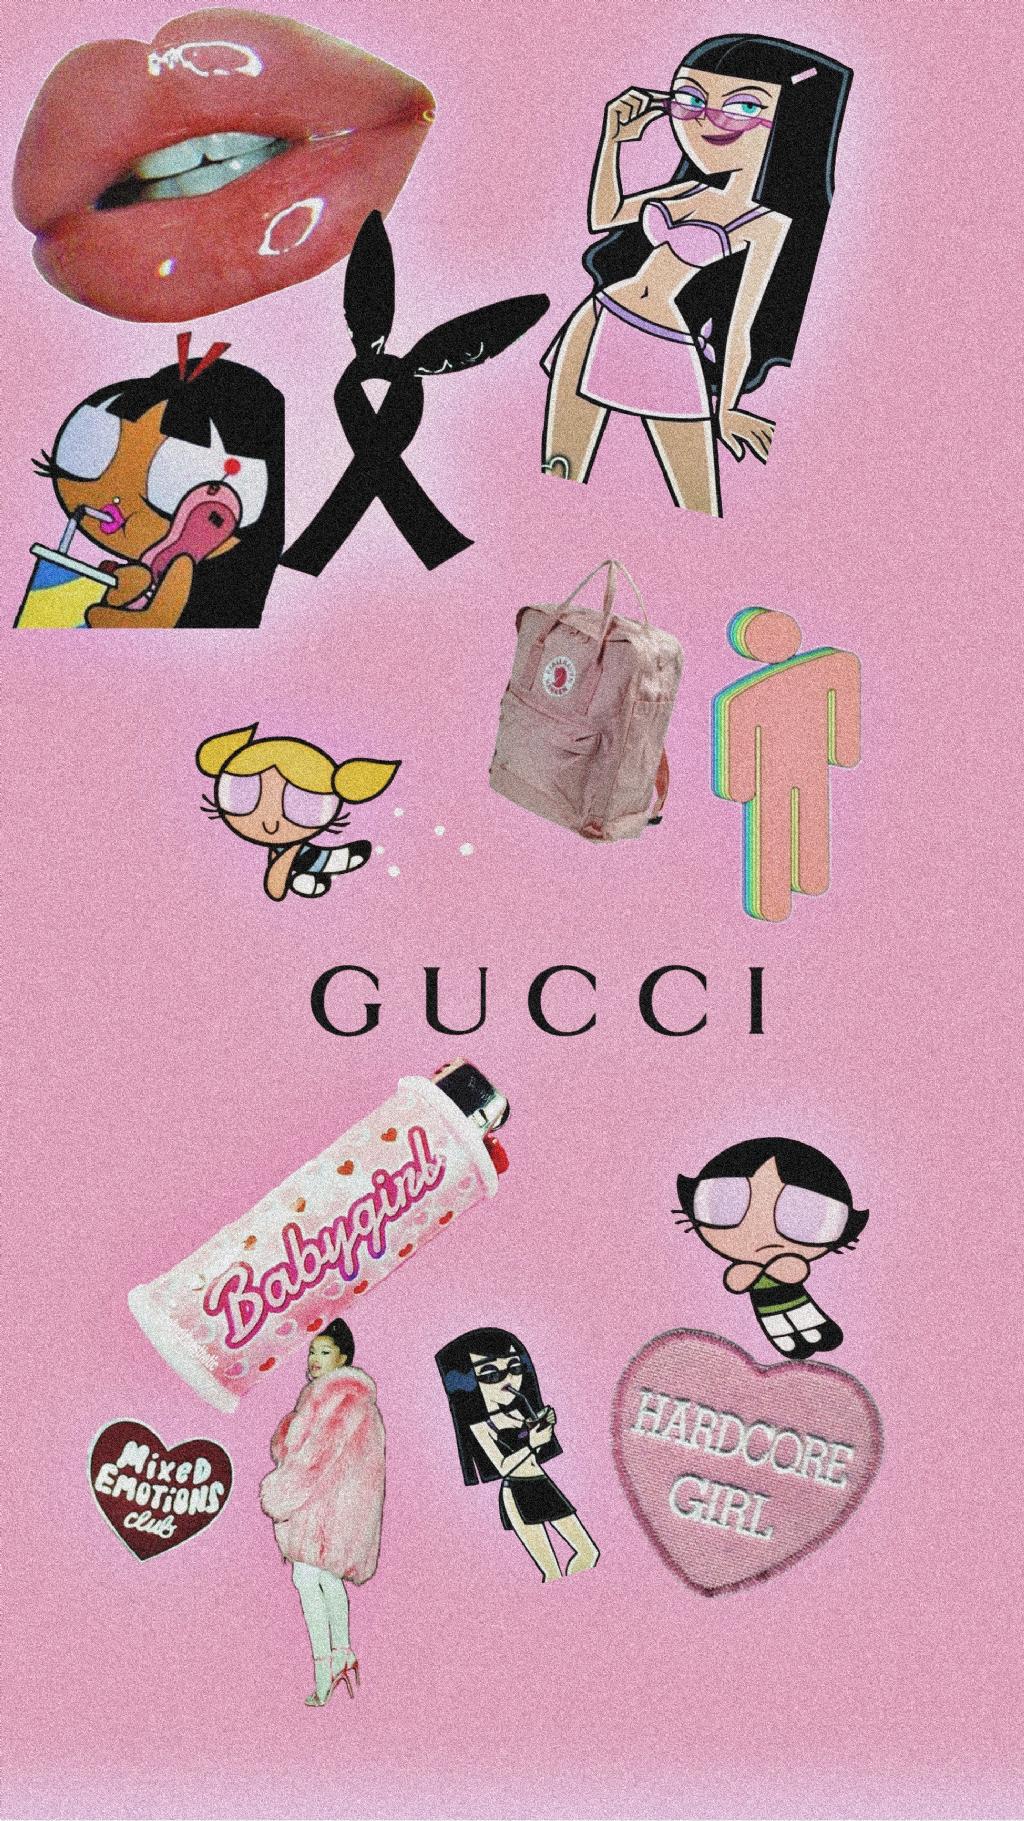 Pin by Abi Stiff on baggrund in 2020 Bad girl wallpaper